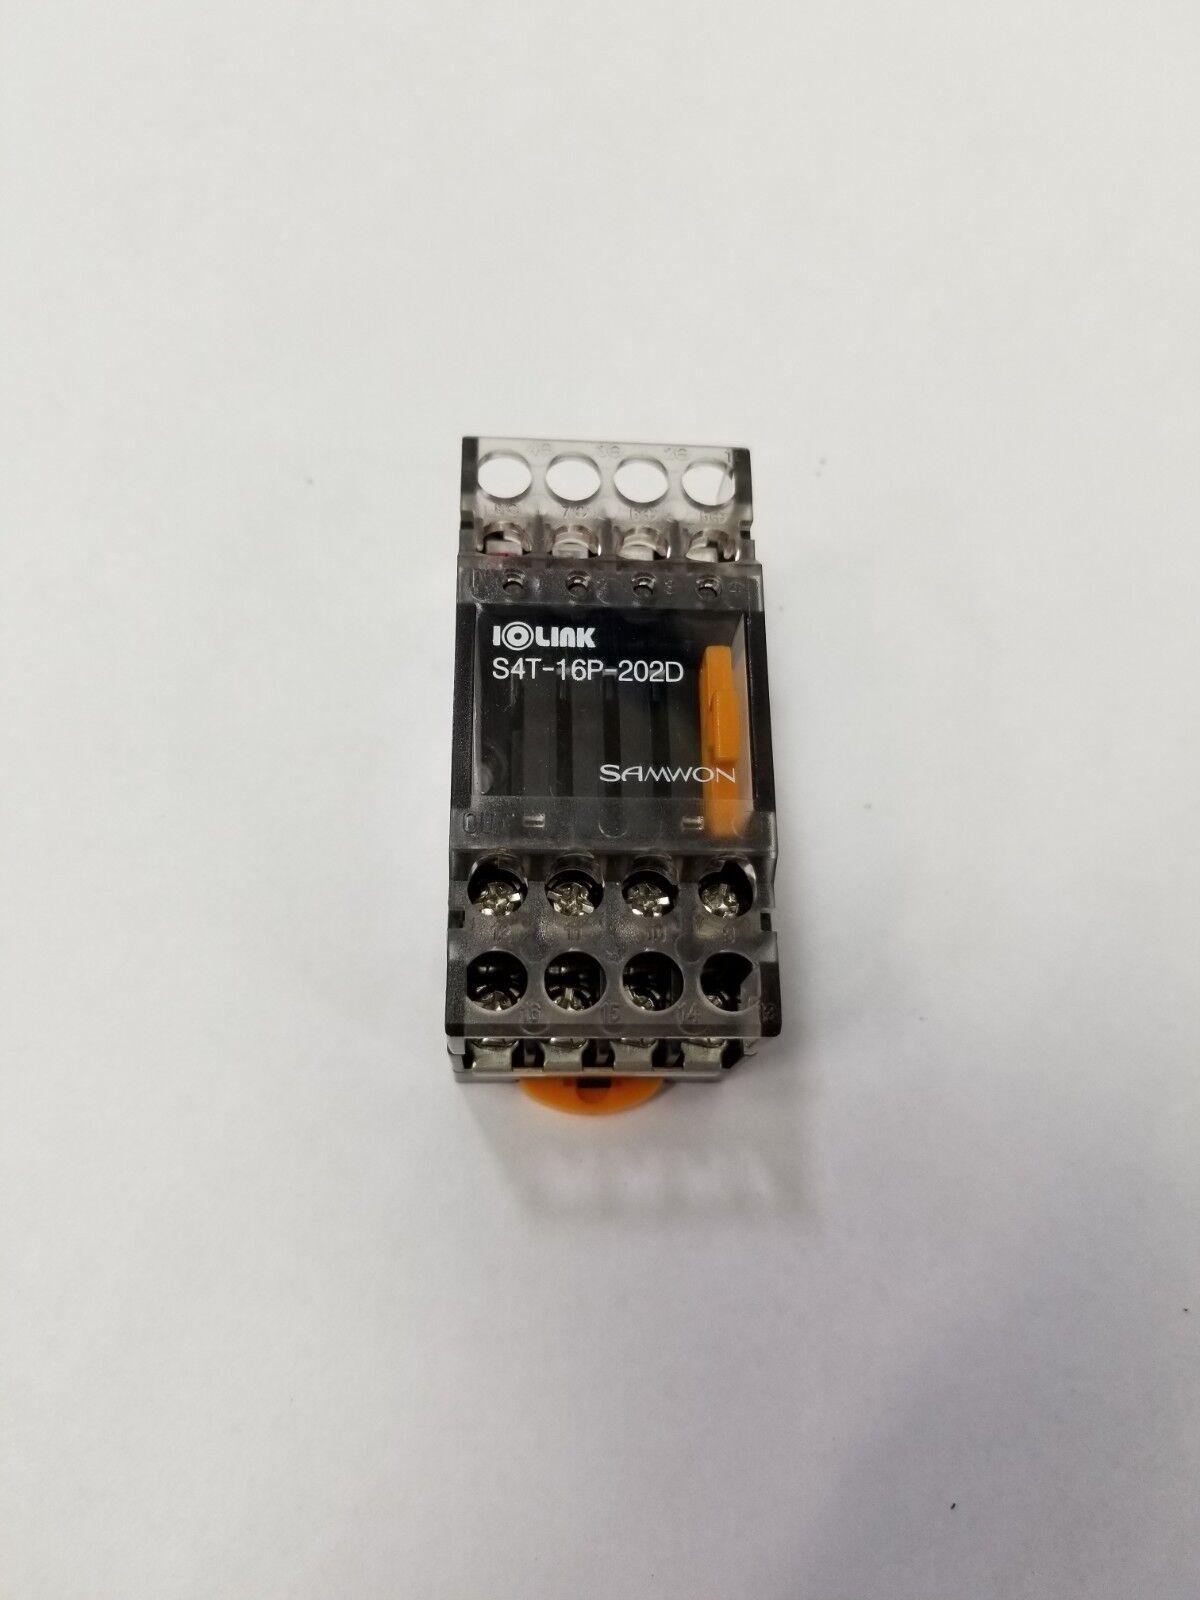 Samwon S4T-16P-202D I O Link Relay Module